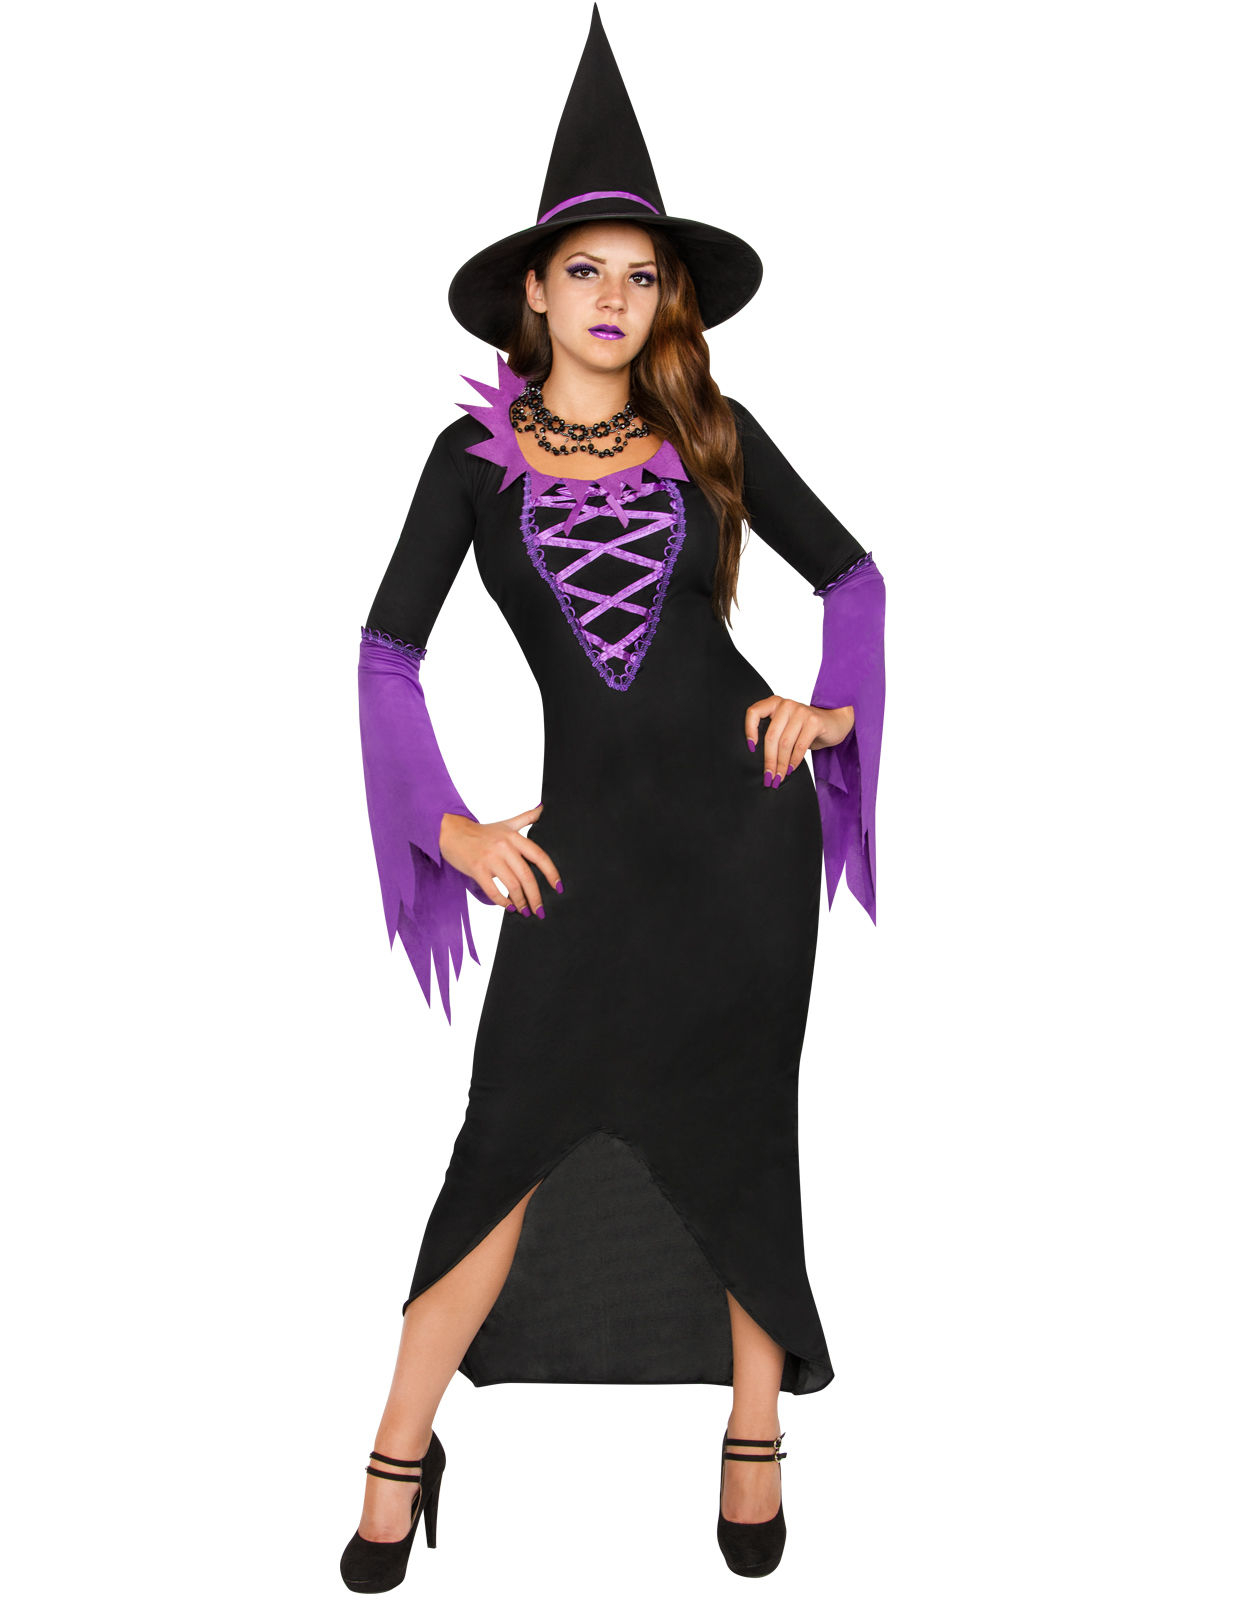 Costume da strega nera e viola per halloween  Costumi adulti 5e19aee43a86